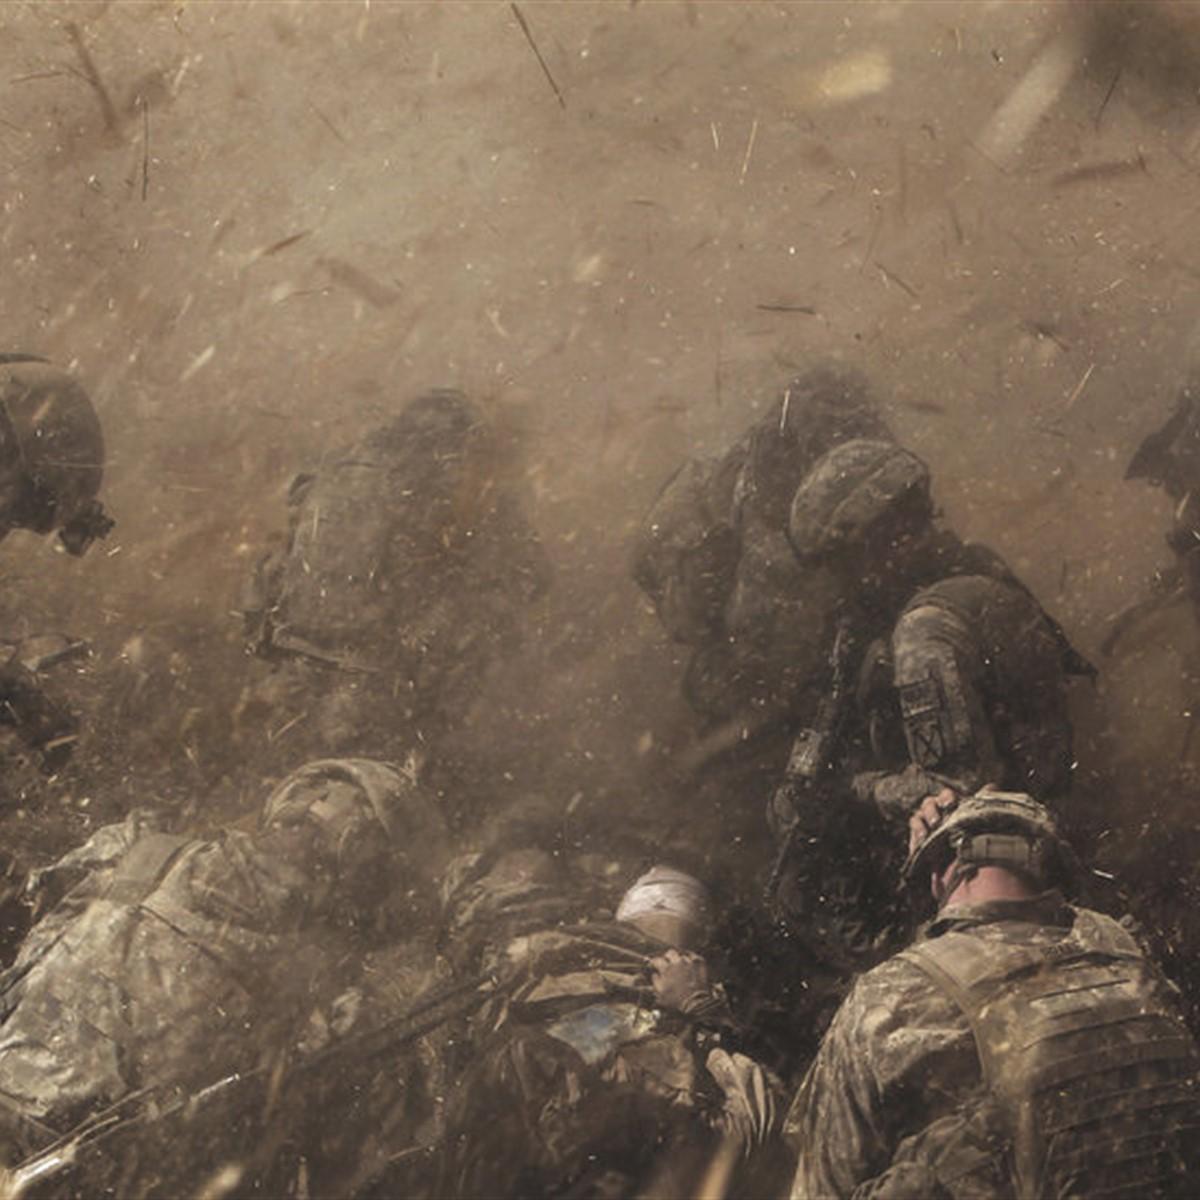 photo essay  years of war in afghanistan digital photography review photo essay  years of war in afghanistan